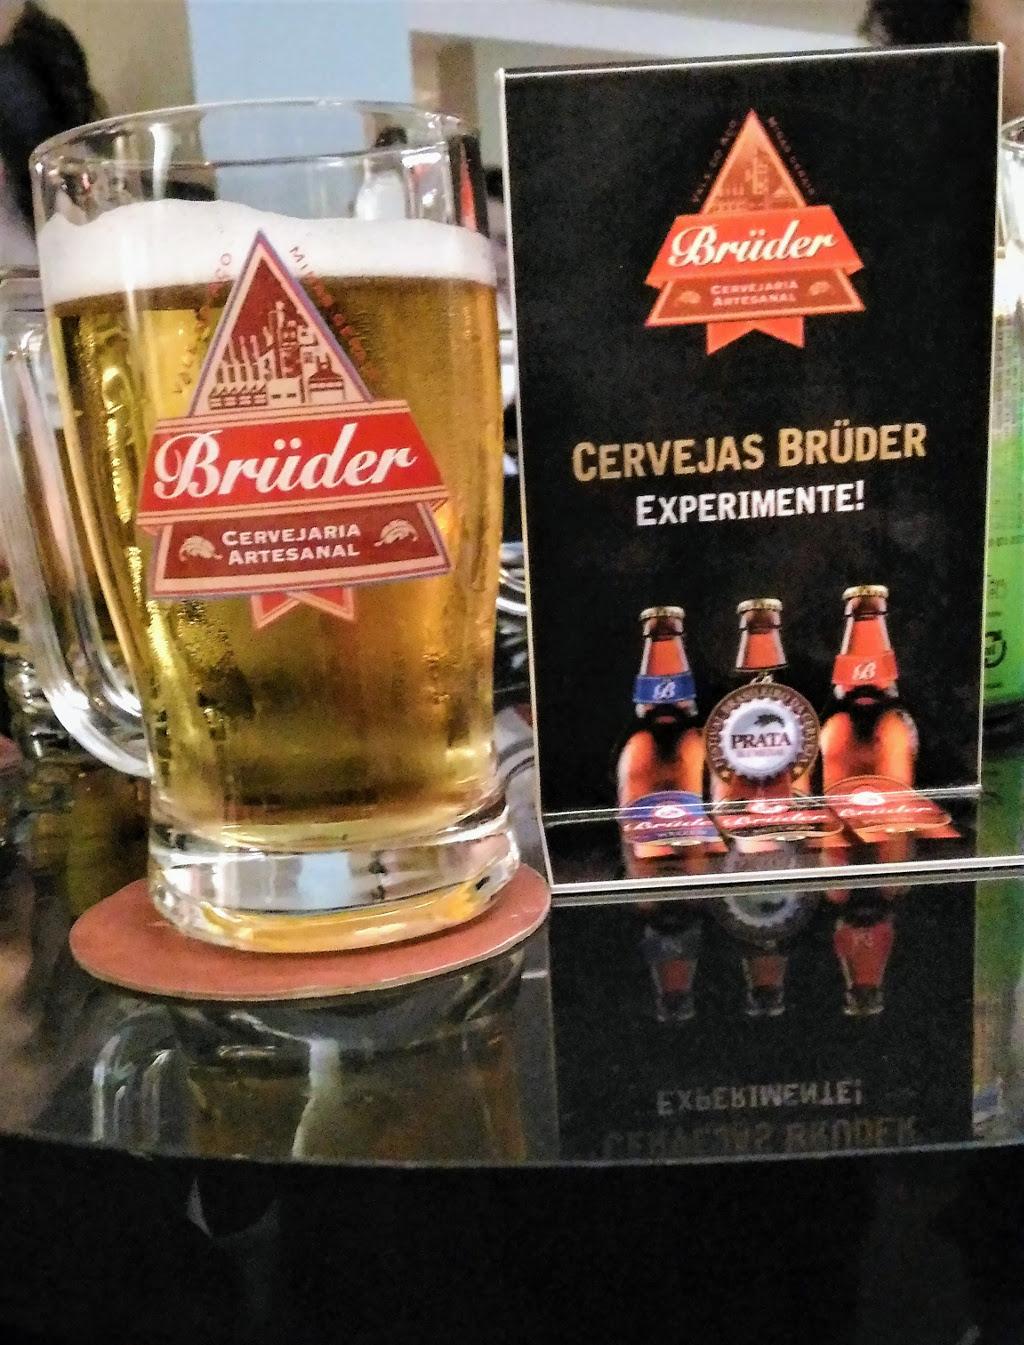 bruder-butiquim-bh-chope